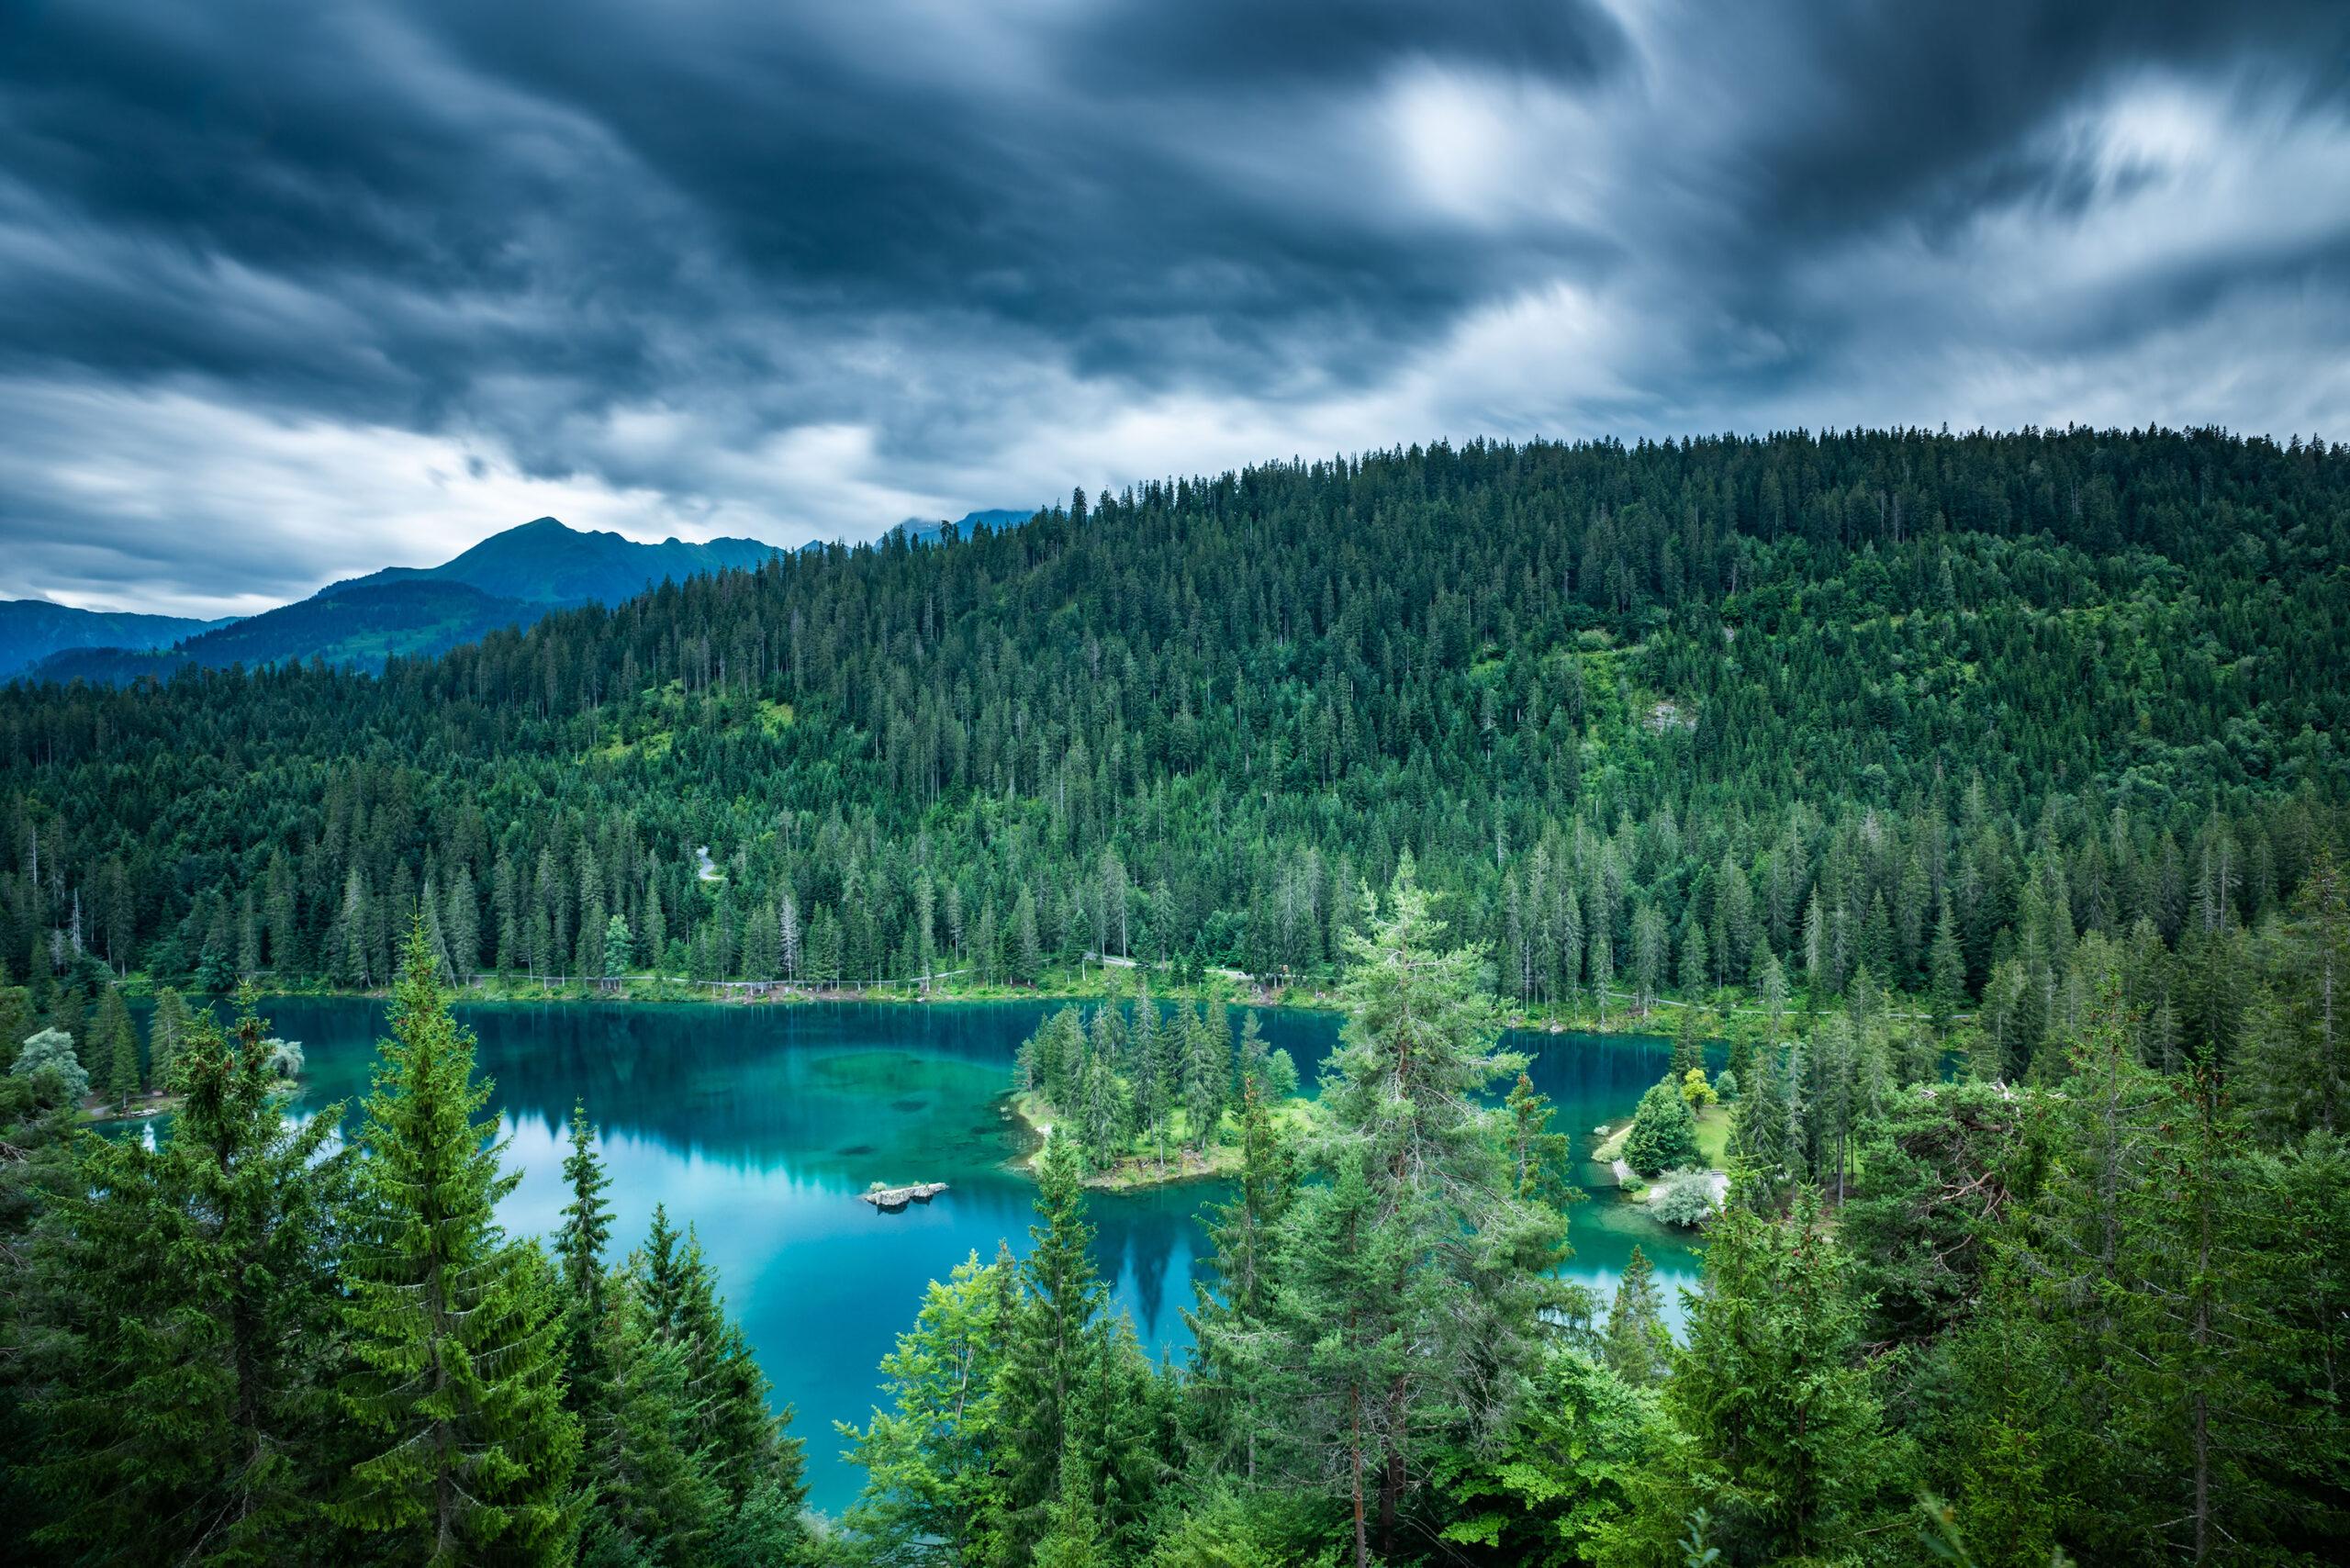 Fine art landscape photography of the Caumasee in Flims, Switzerland. Image by Jennifer Esseiva.